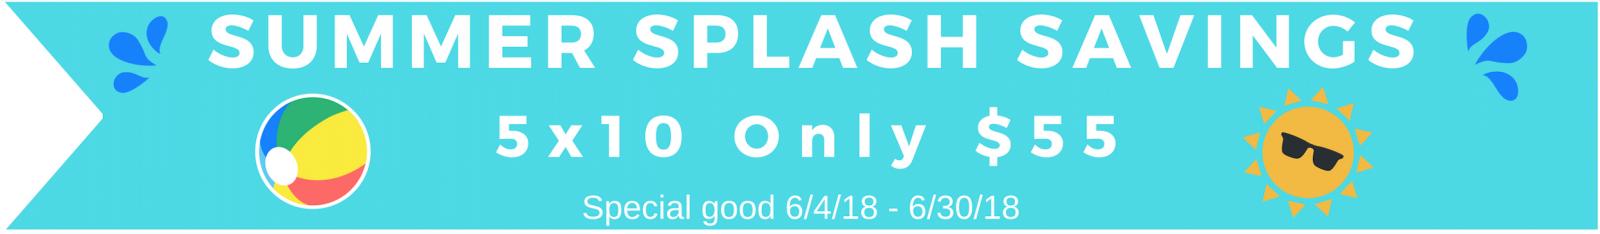 Summer Splash Savings! 5x10 Only $55